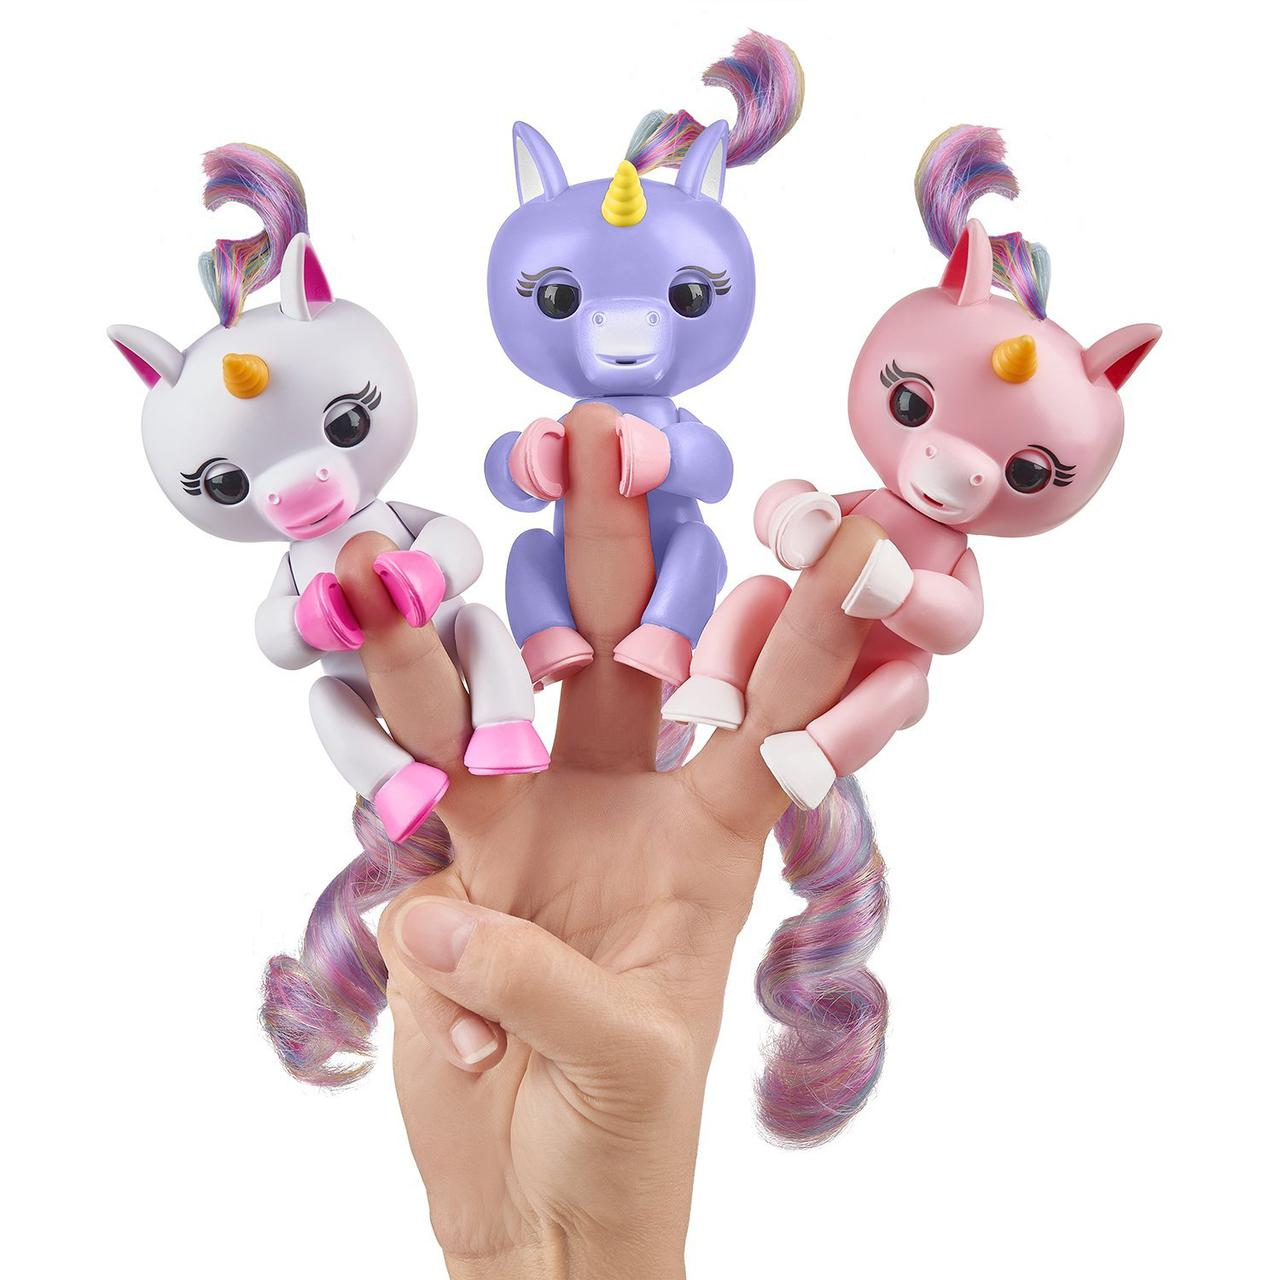 Единорог интерактивный на пальчик , WowWee Fingerlings Baby Unicorn Оригинал из США